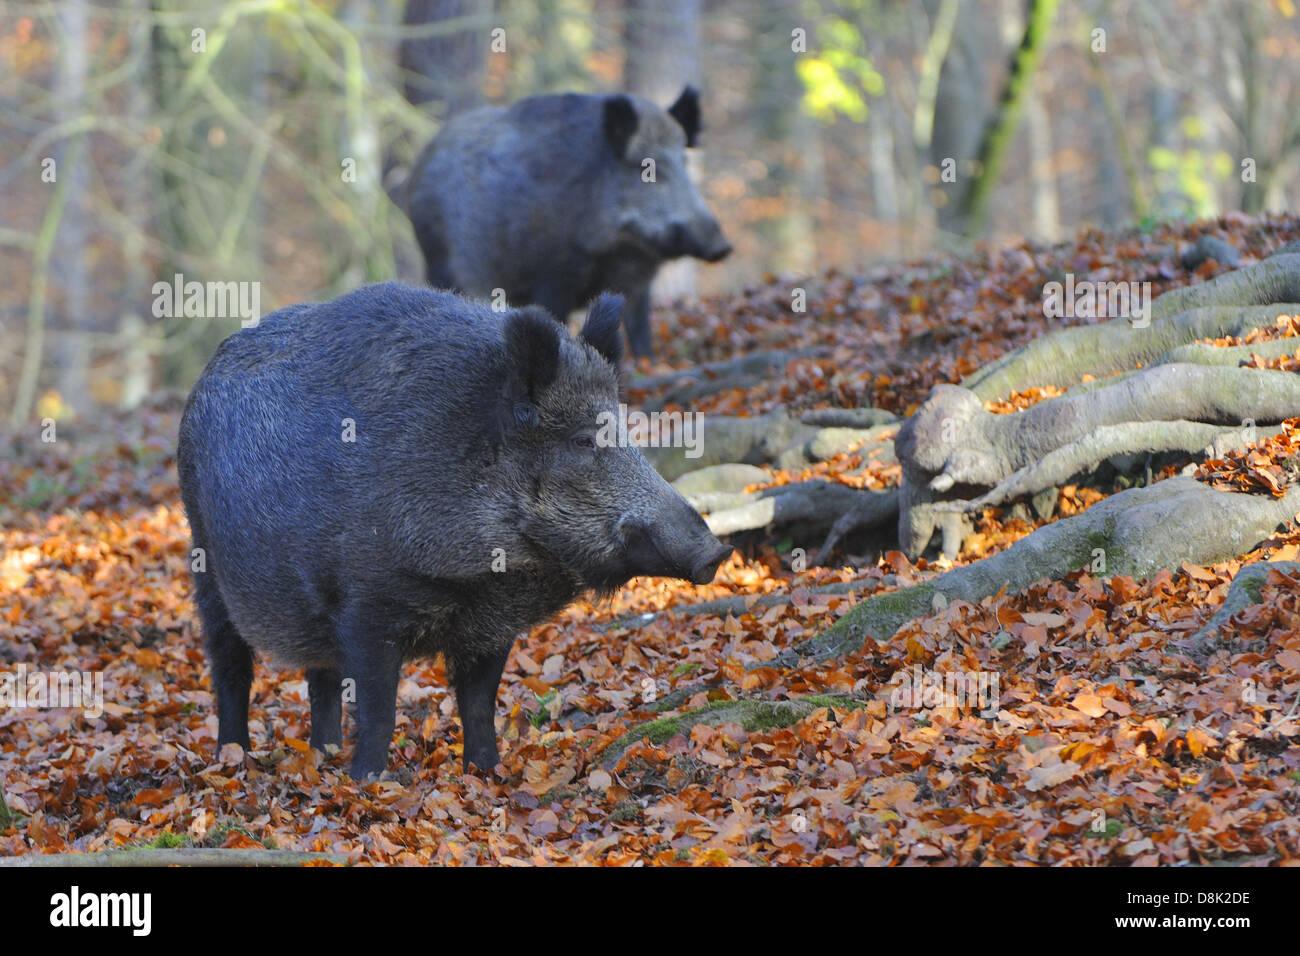 Wild boar - Stock Image